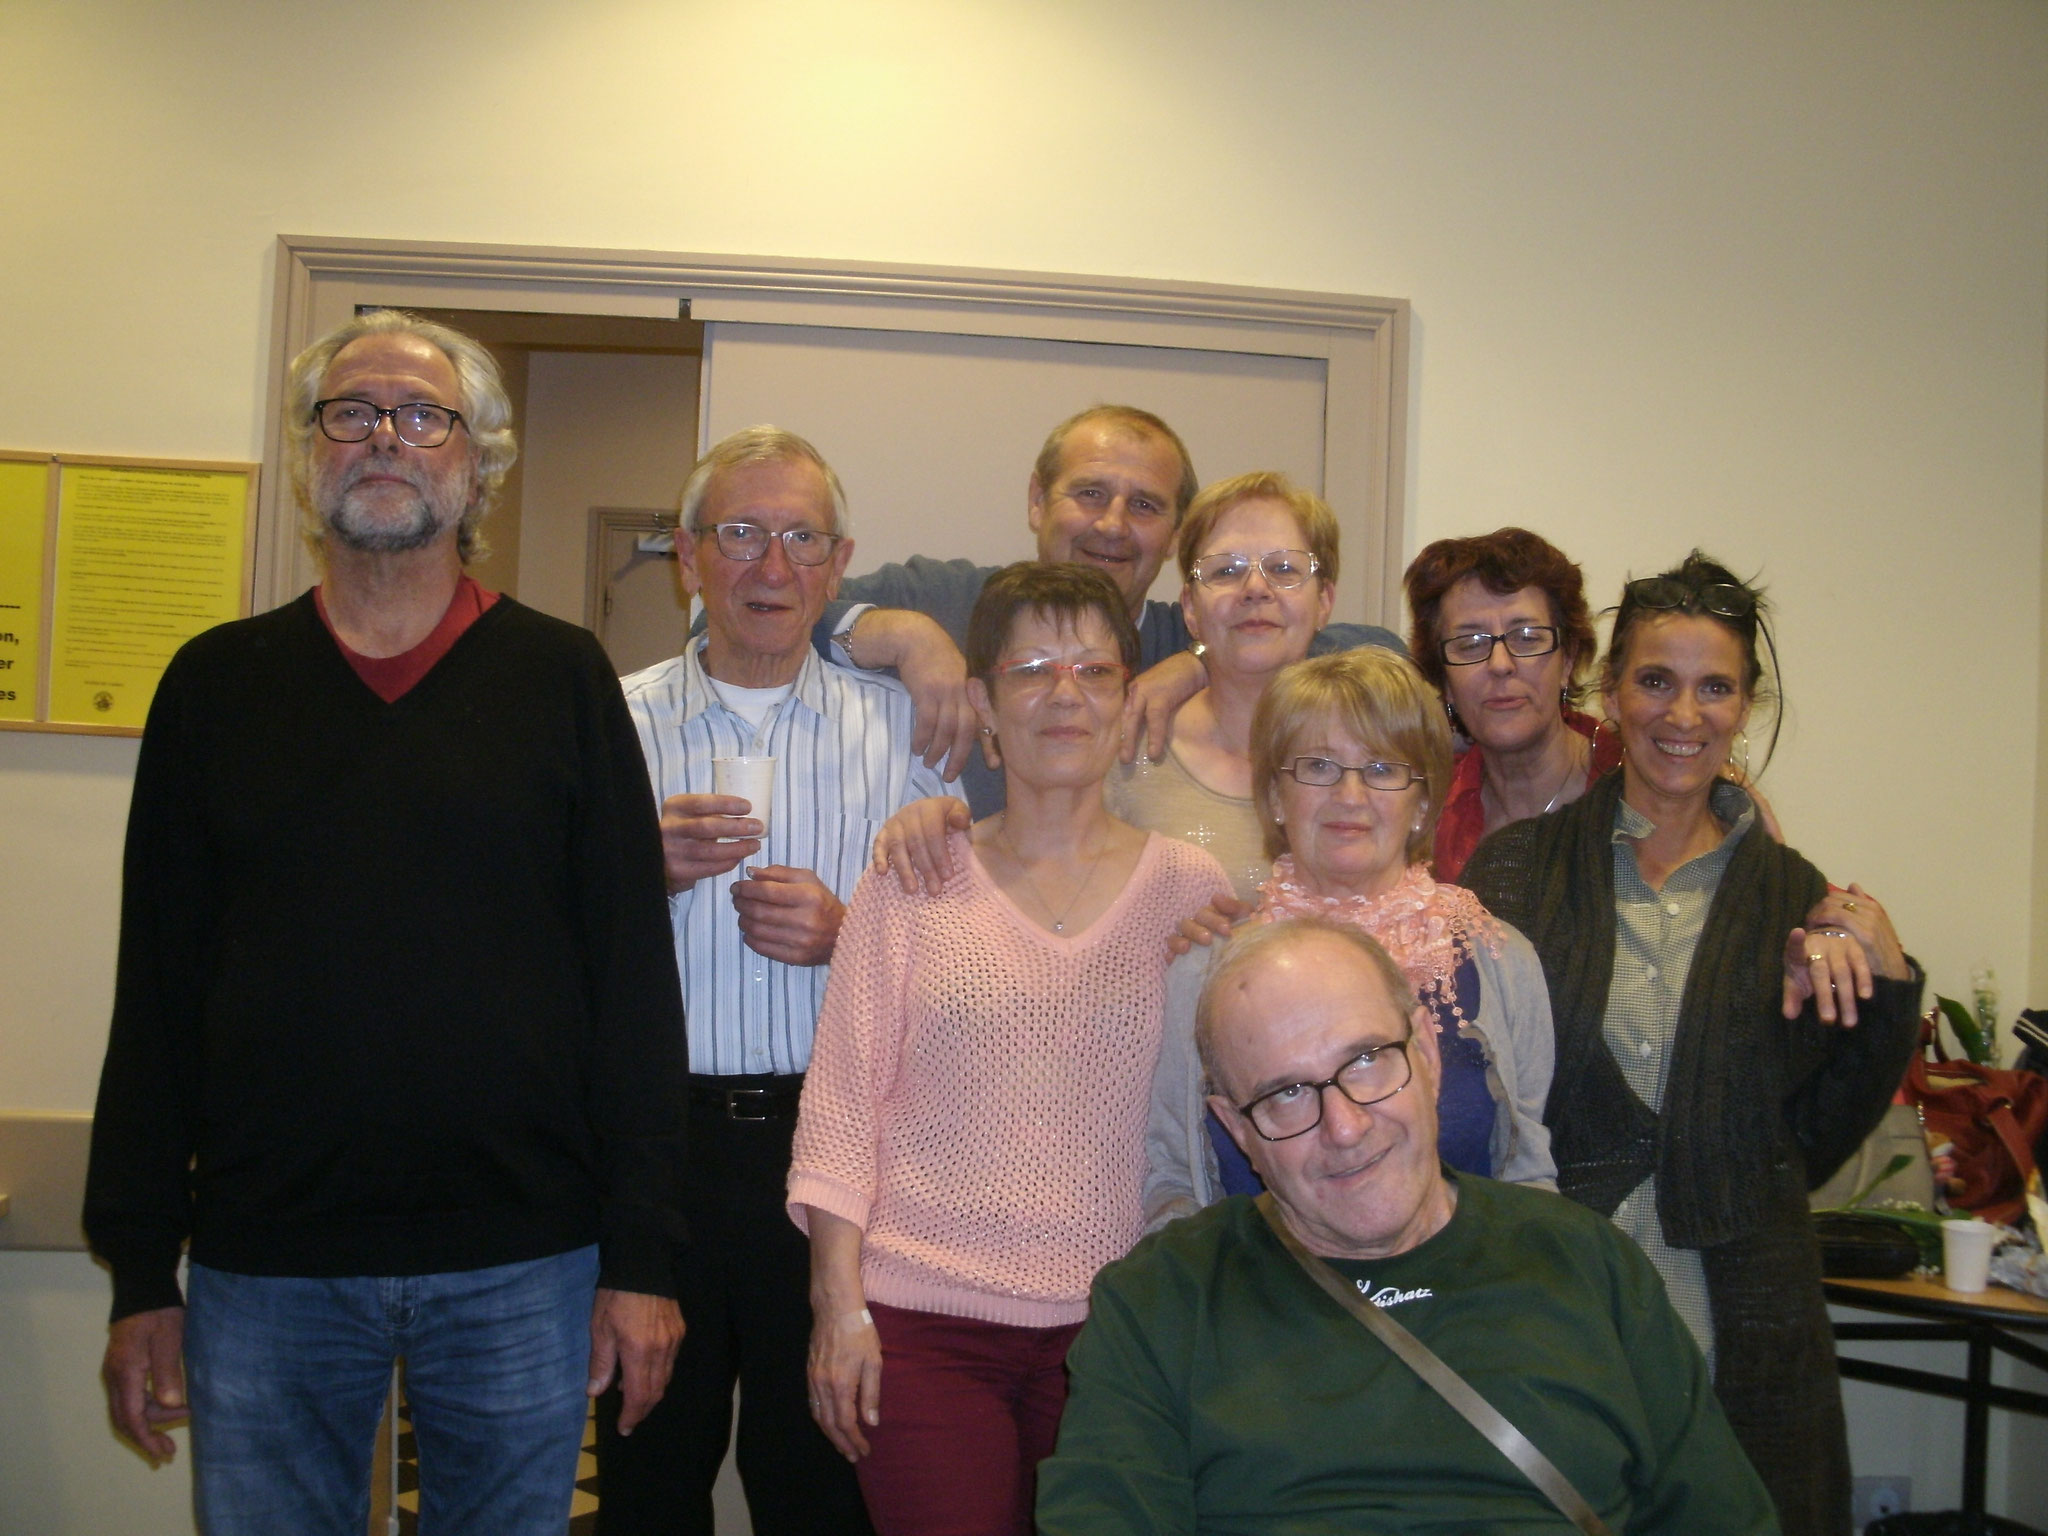 Le 29 Avril 2016,Anniv d'Annie,Isabelle,Marie-Christine,Marie-Jeanne,Odile,Alain,Bernard,Daniel et Régis,